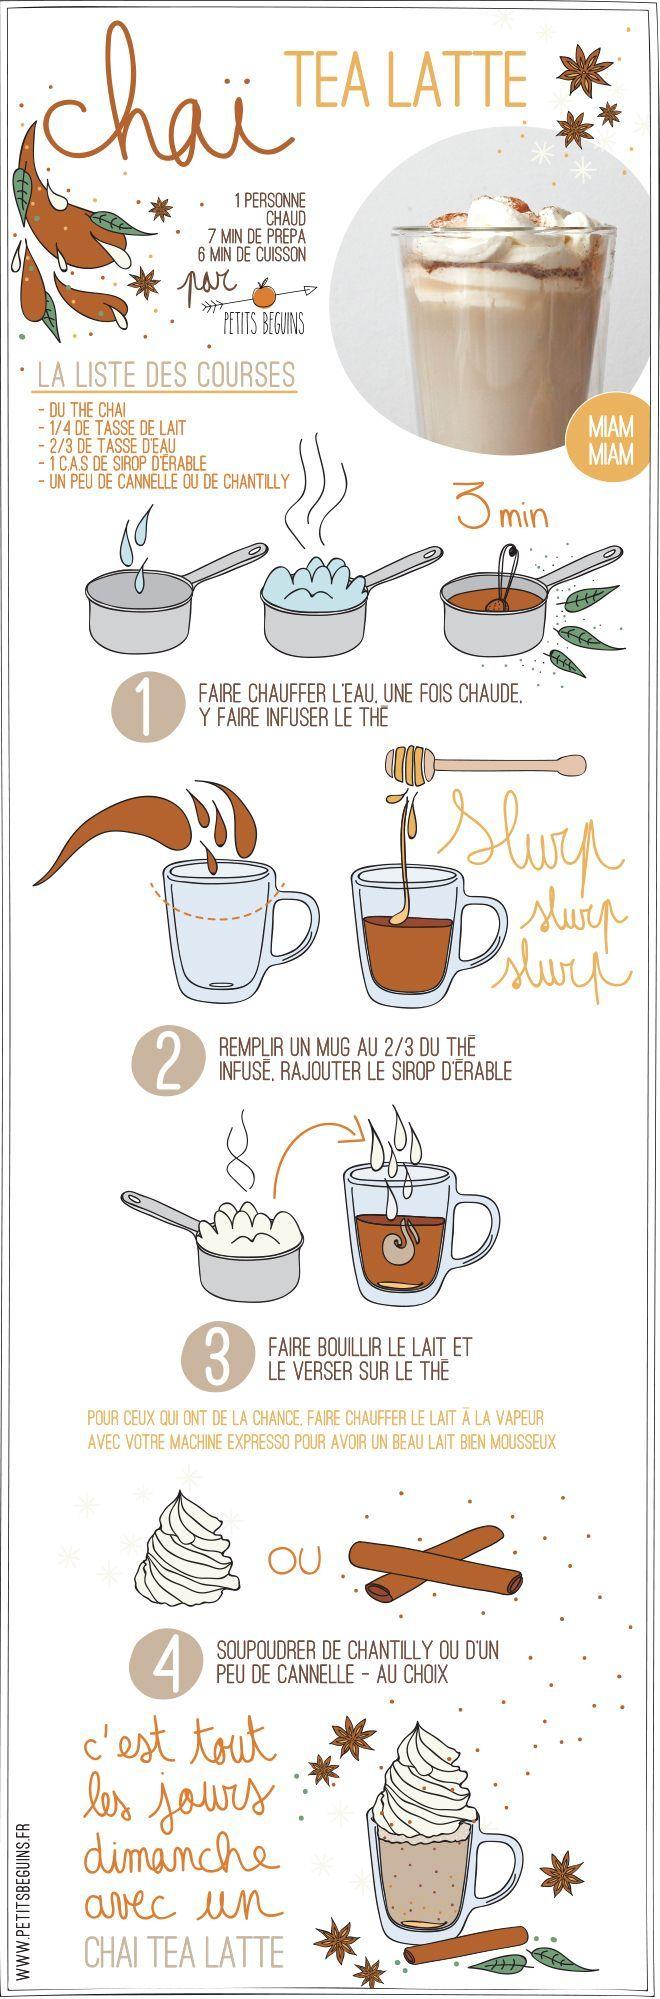 Chai tea latte - Boisson chaude